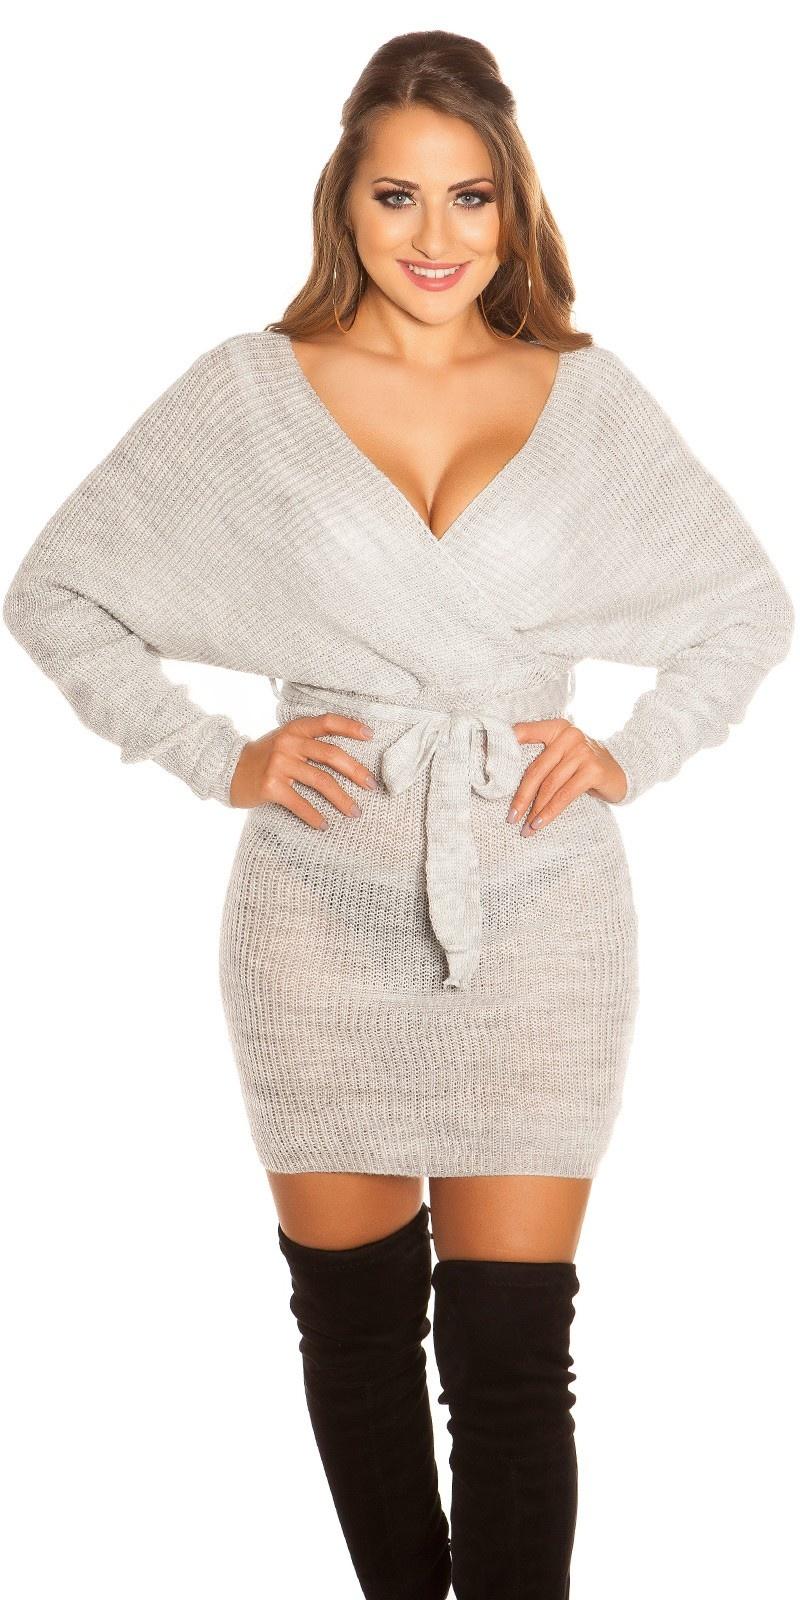 Sexy grof gebreid mini jurkje met riem grijs